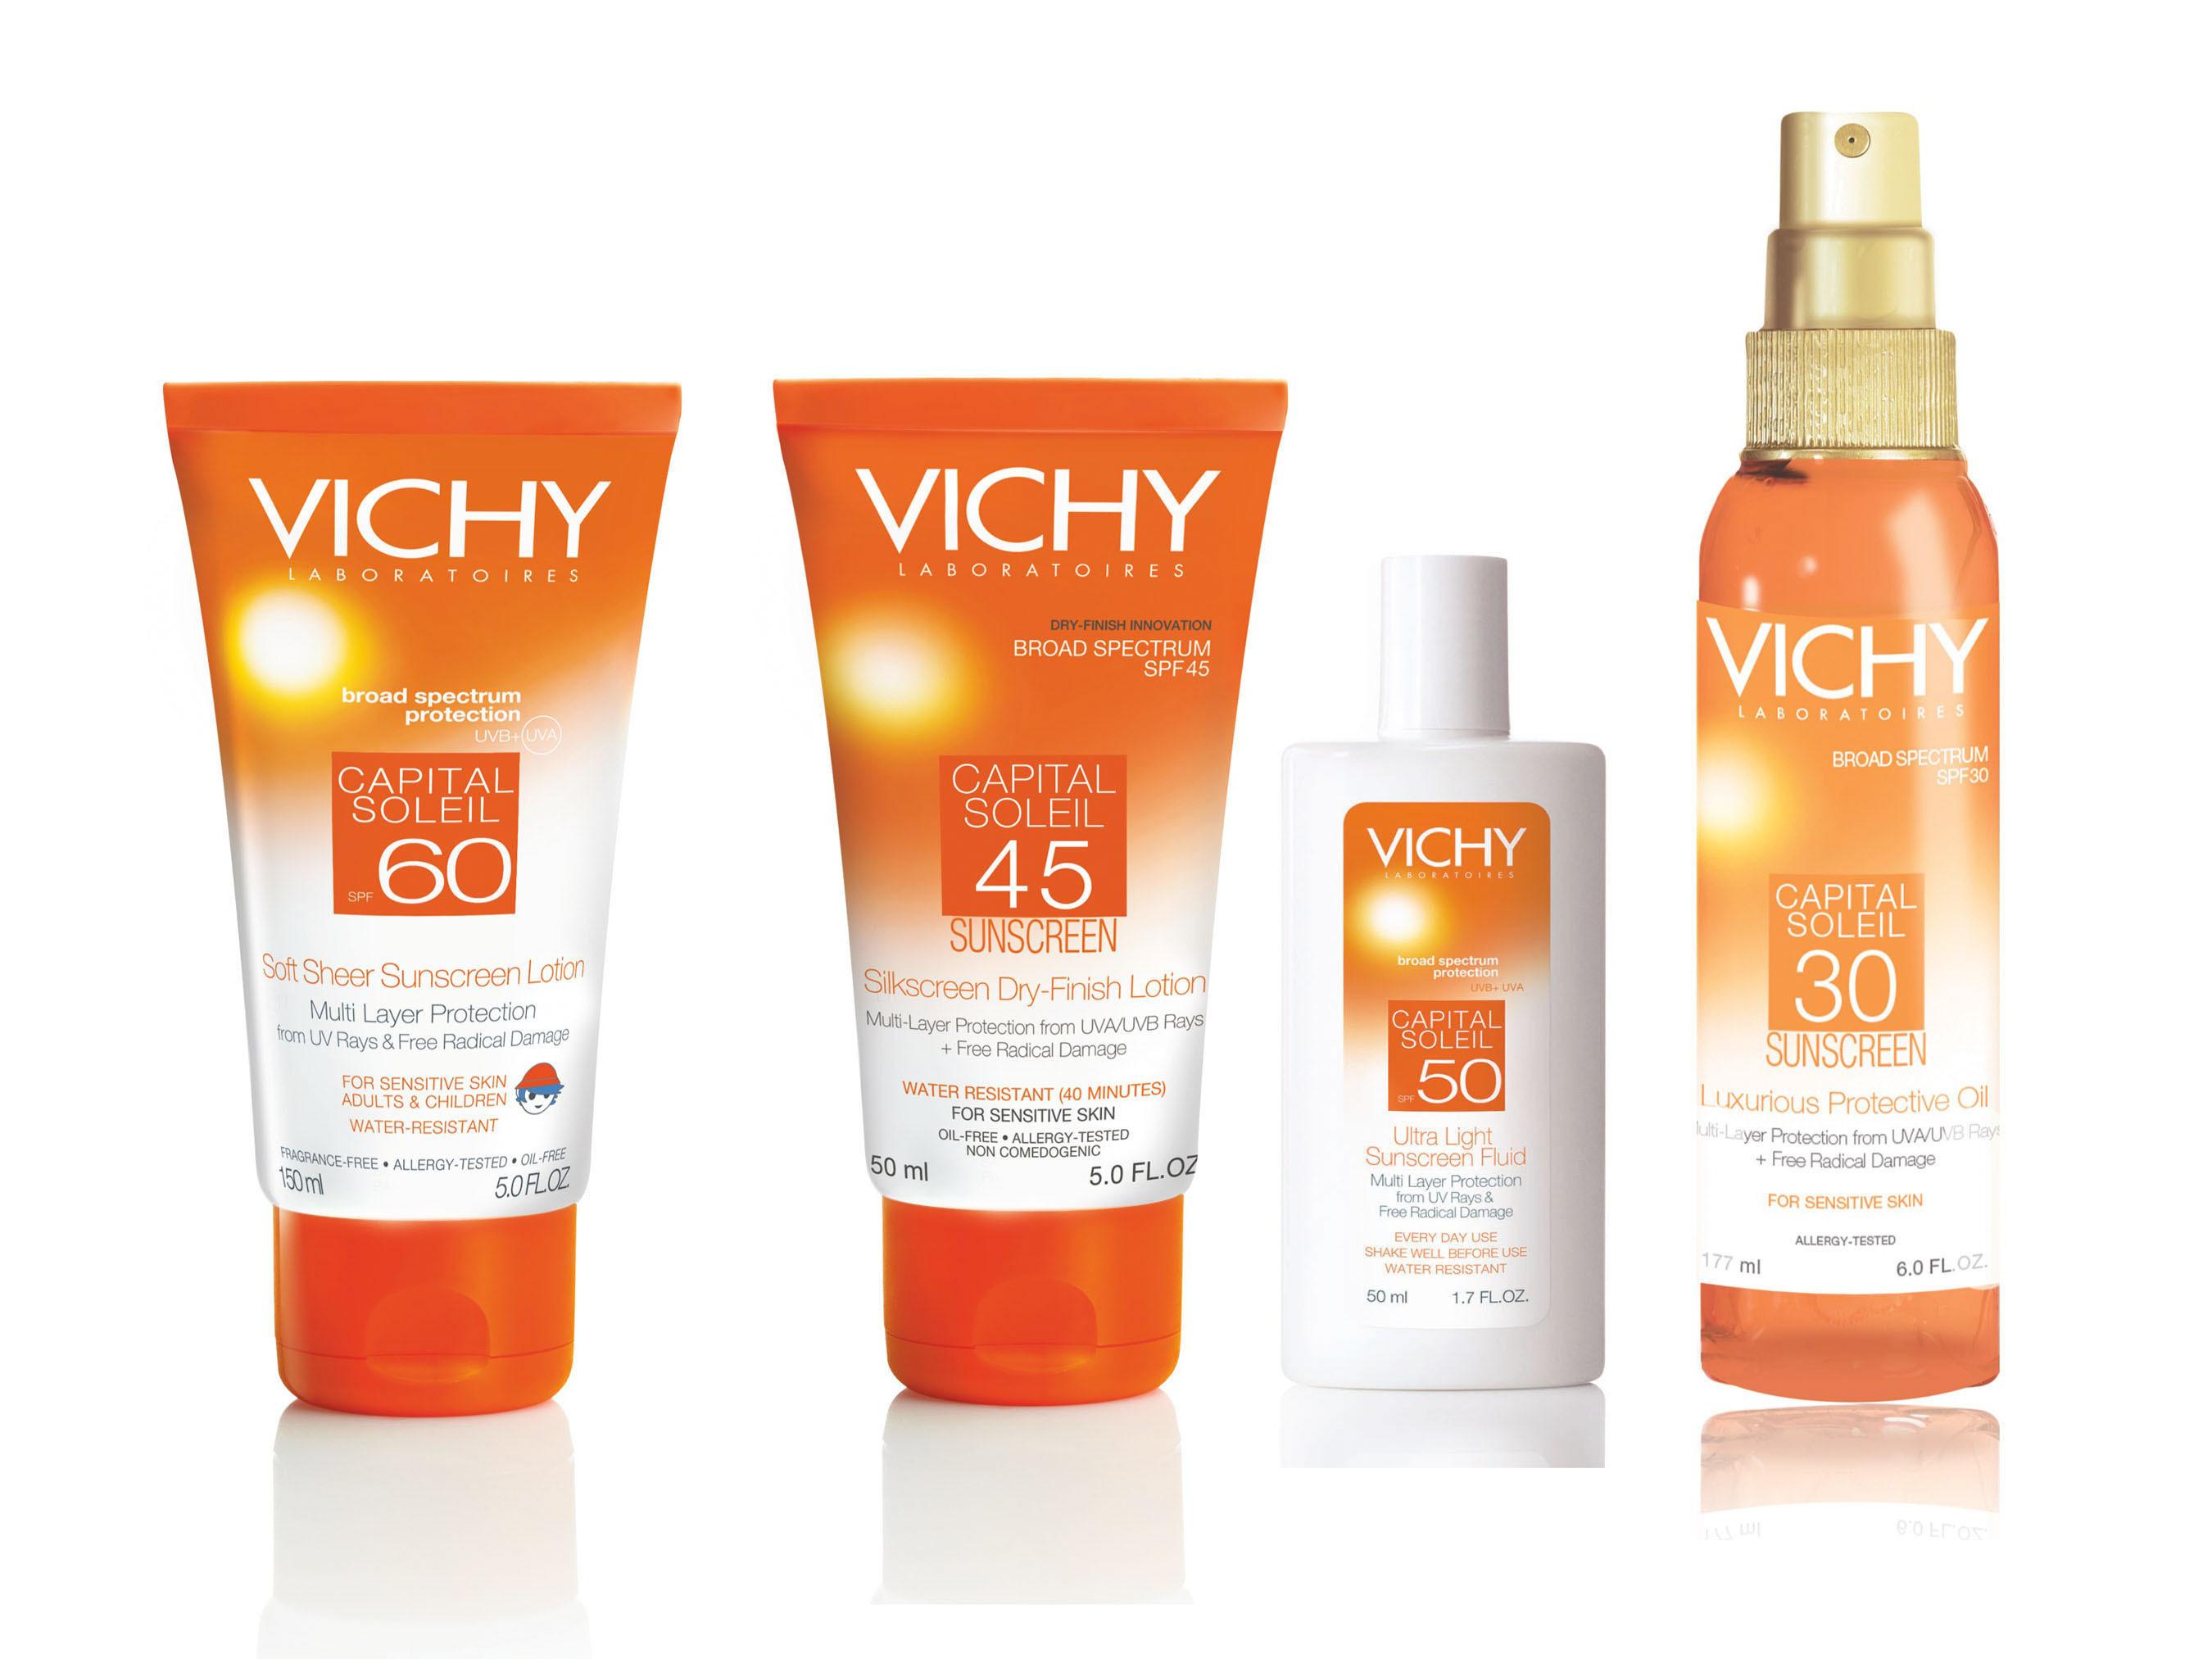 The Best Sunscreens for a Rich Golden Glow